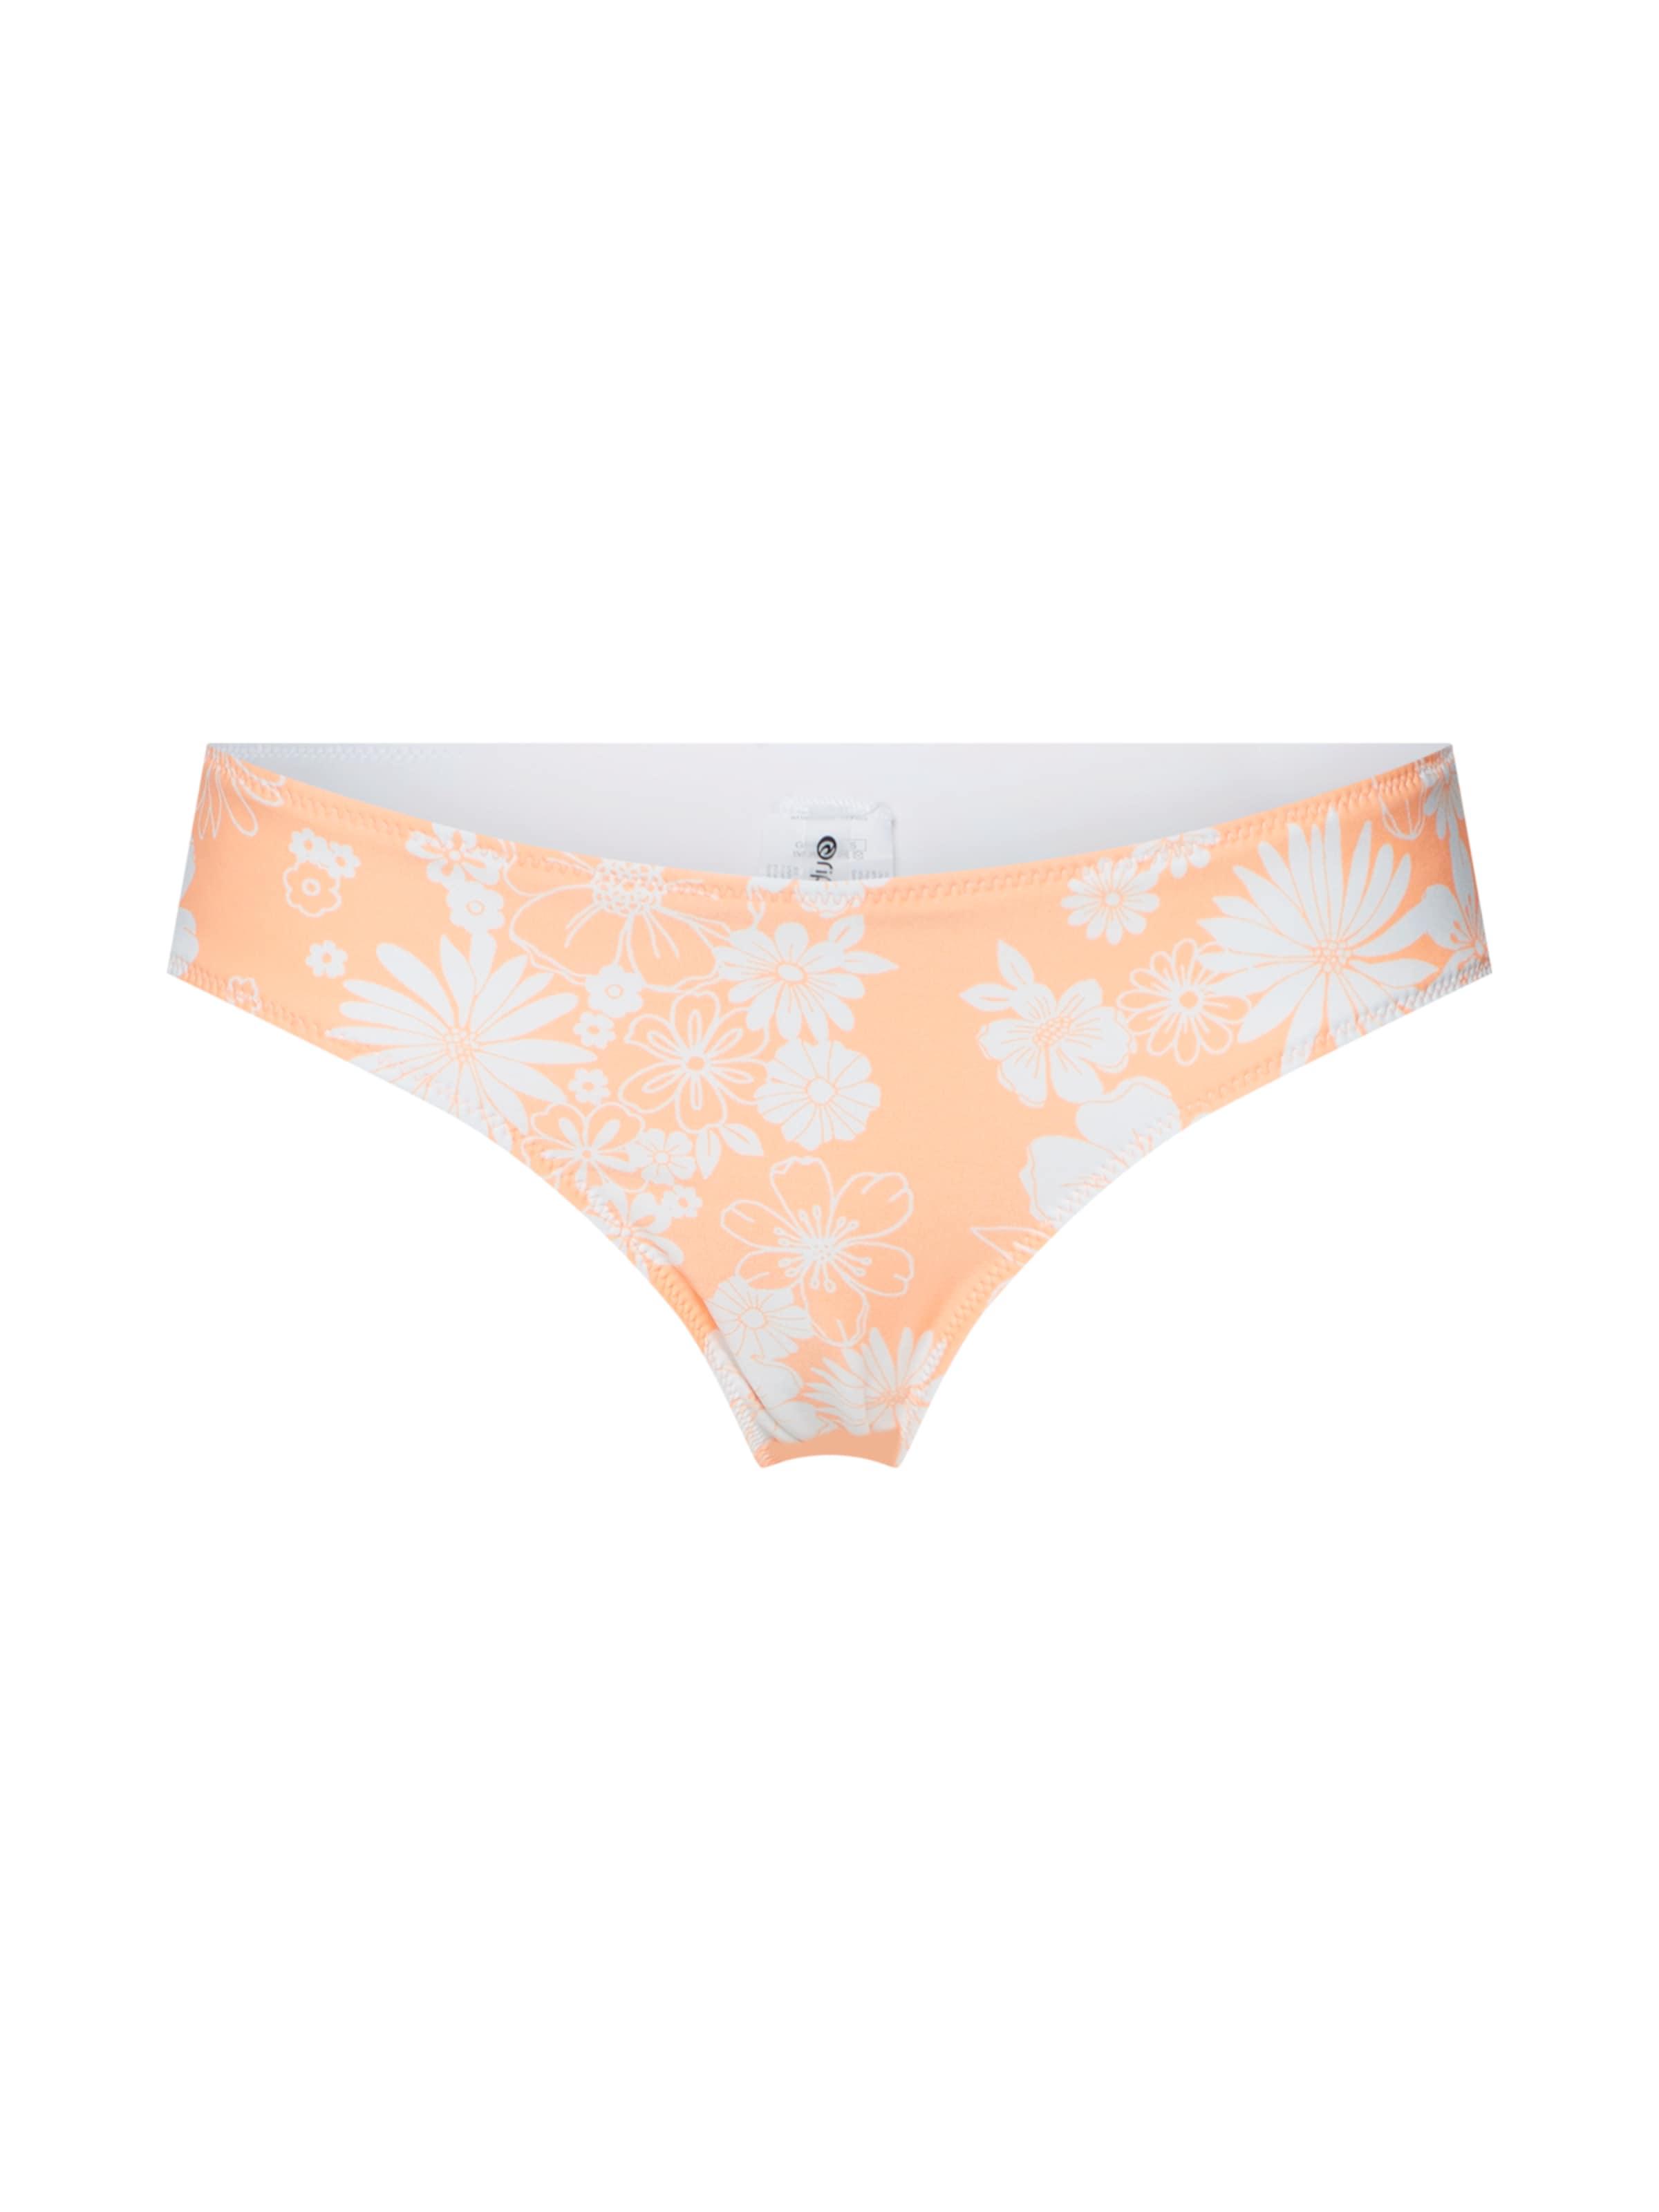 De En 'salty Rip Curl Daisy Bas PêcheBlanc Revo Pant' Good Bikini 4jq5LRA3